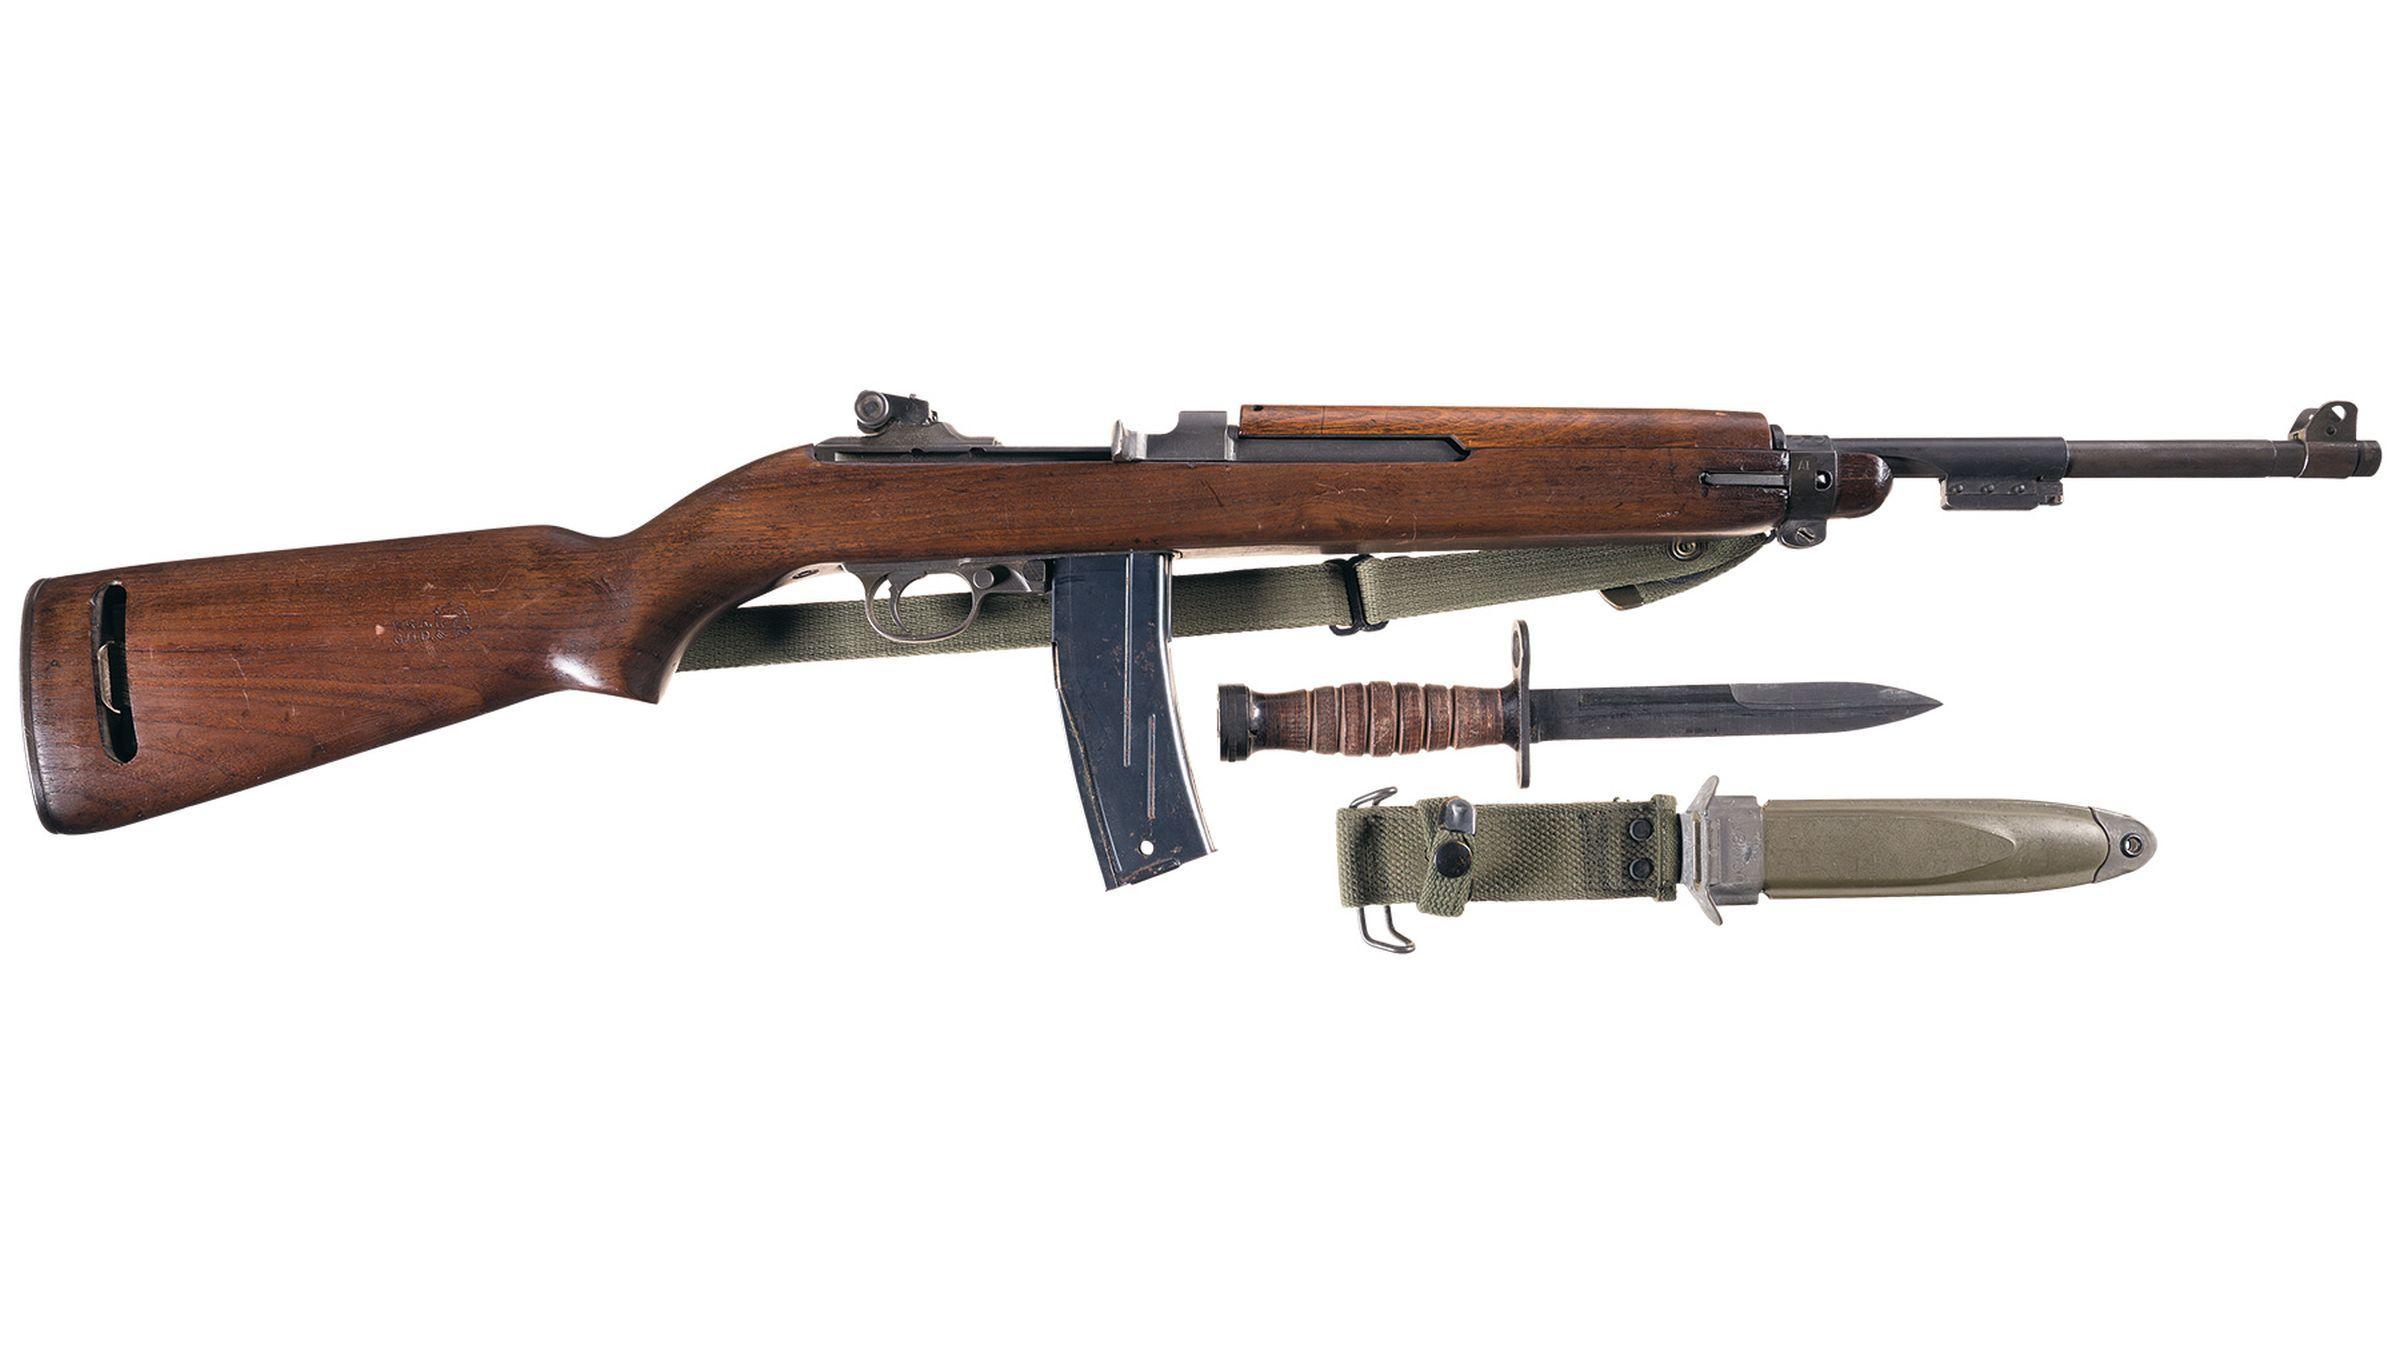 U S  Winchester M1 Carbine w/2 Ex  Mags, Bayonet